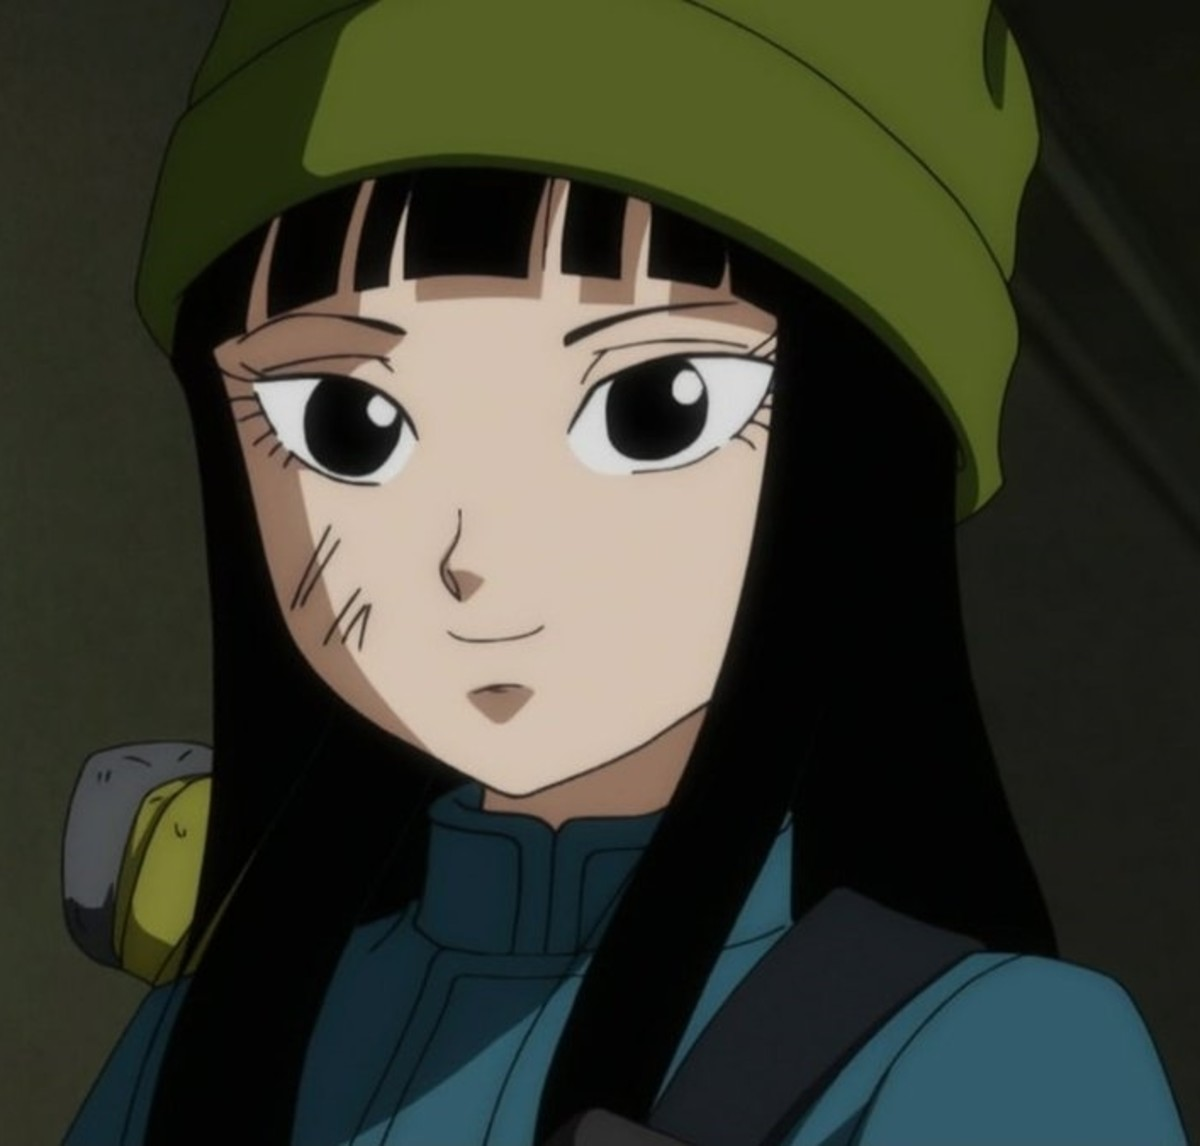 Mai in Future Trunks's timeline